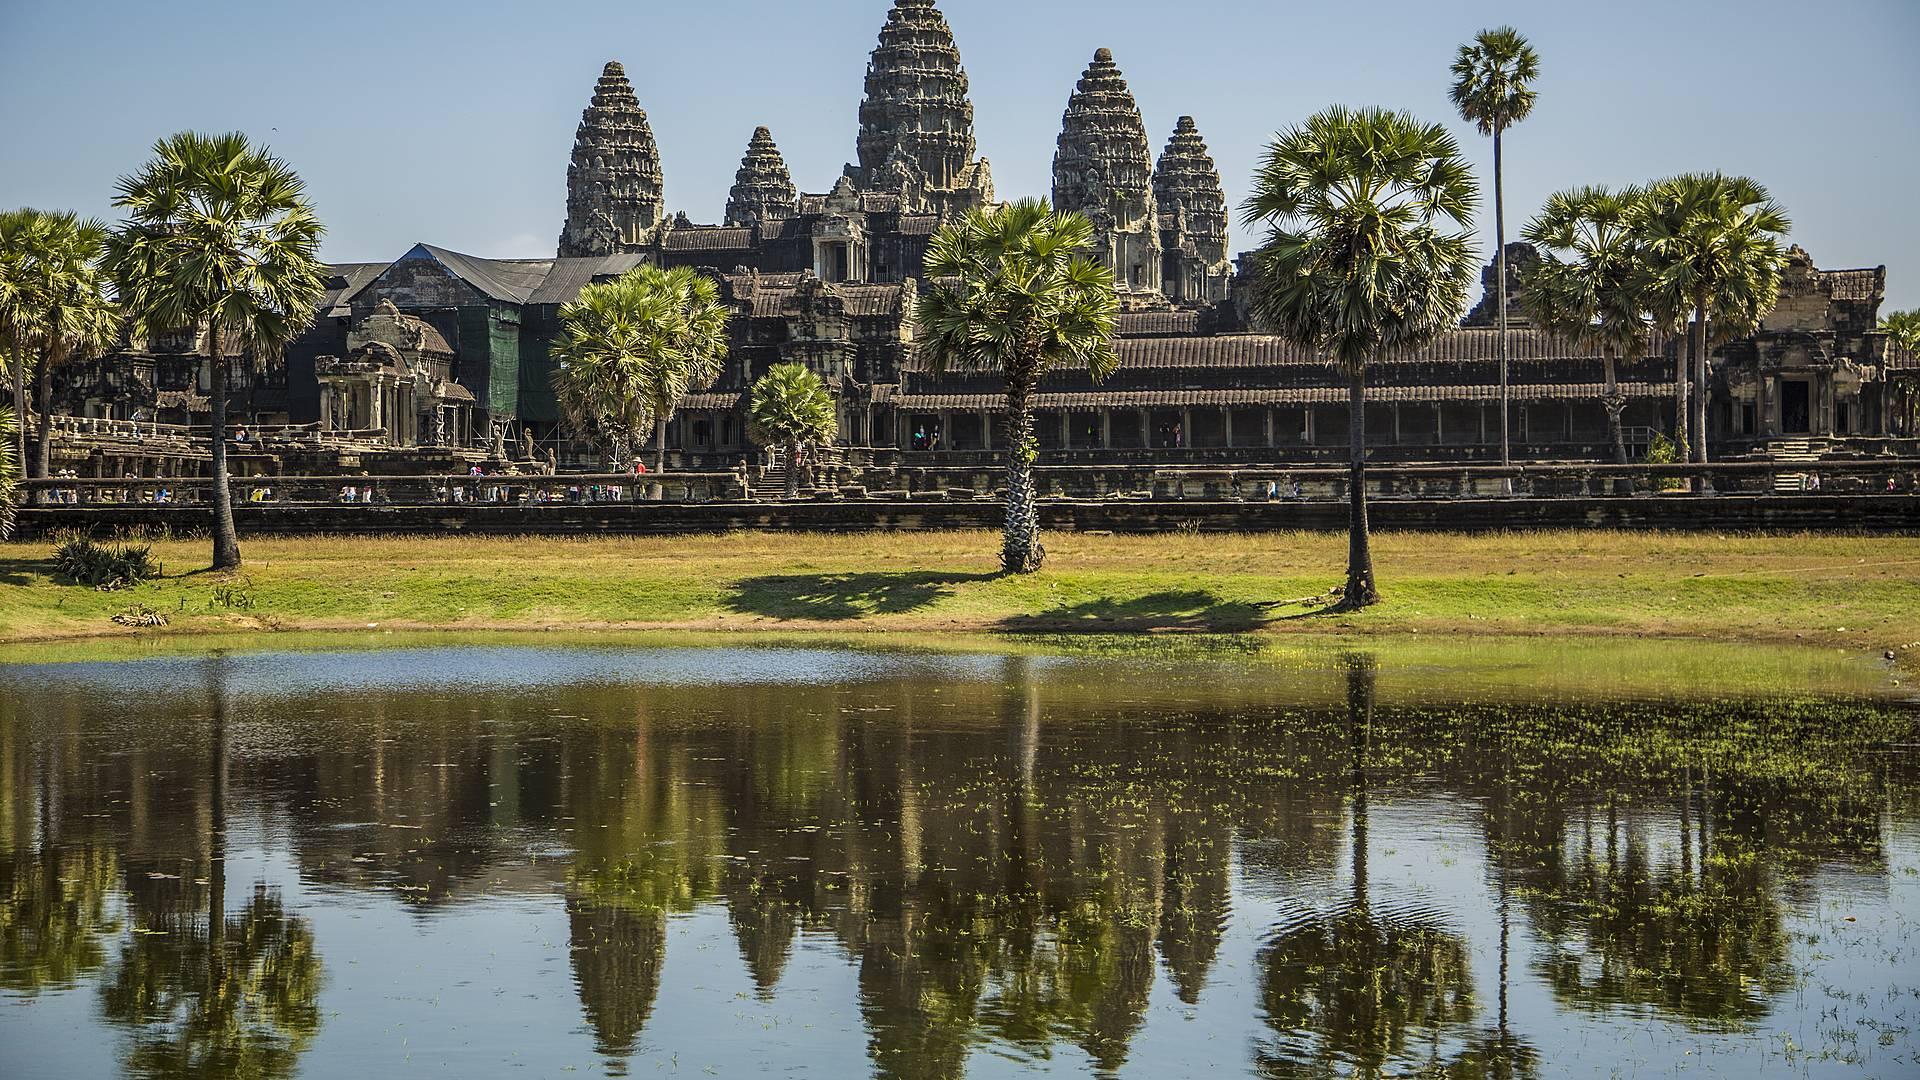 Die Tempelwelt bei Siem Reap